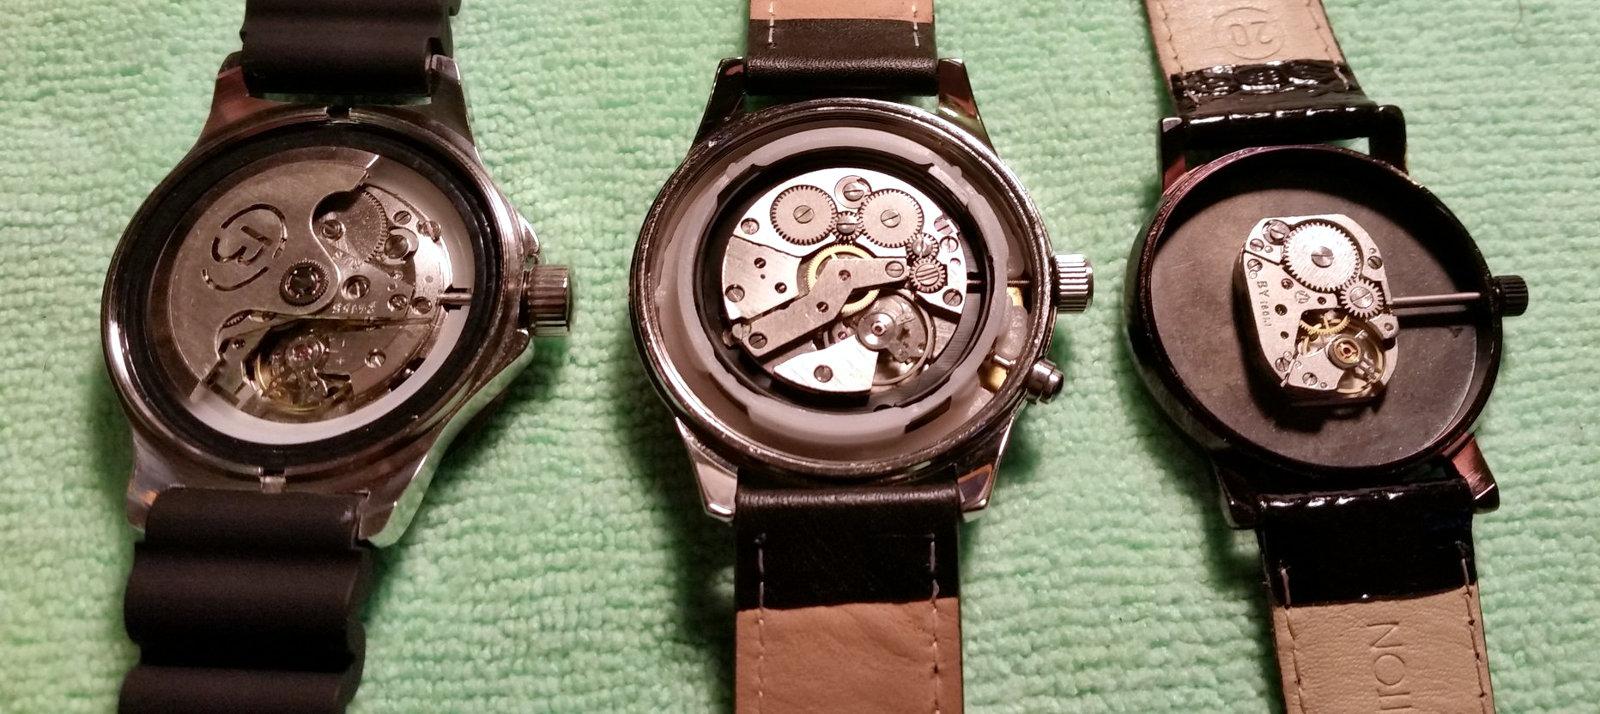 relojes-vostok_personalizables_1942_vostok_luch